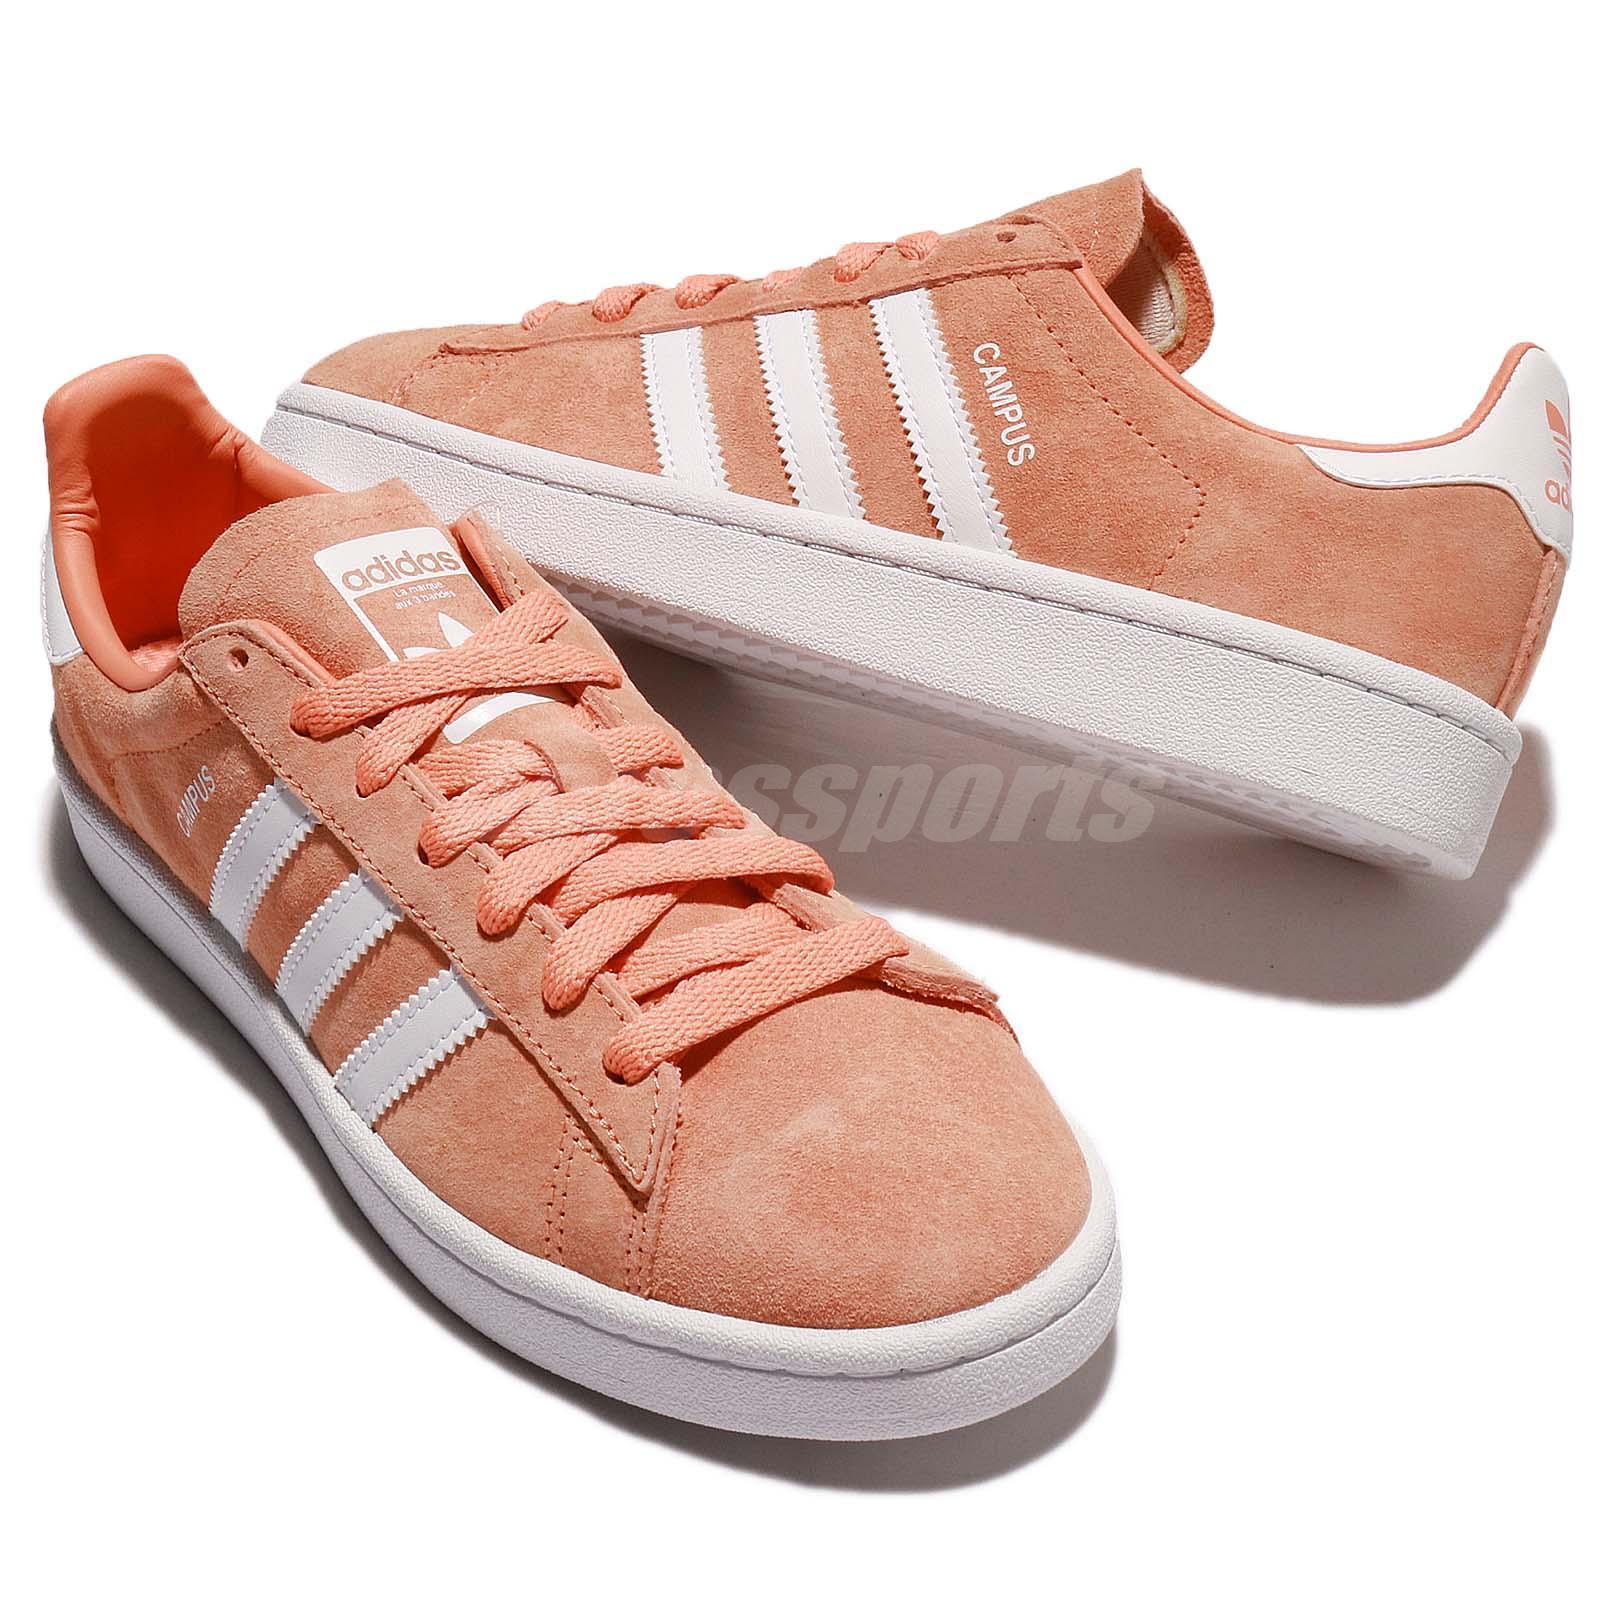 365aa02e84b0 adidas Originals Campus Nubuck Orange White Men Women Shoes Sneakers ...